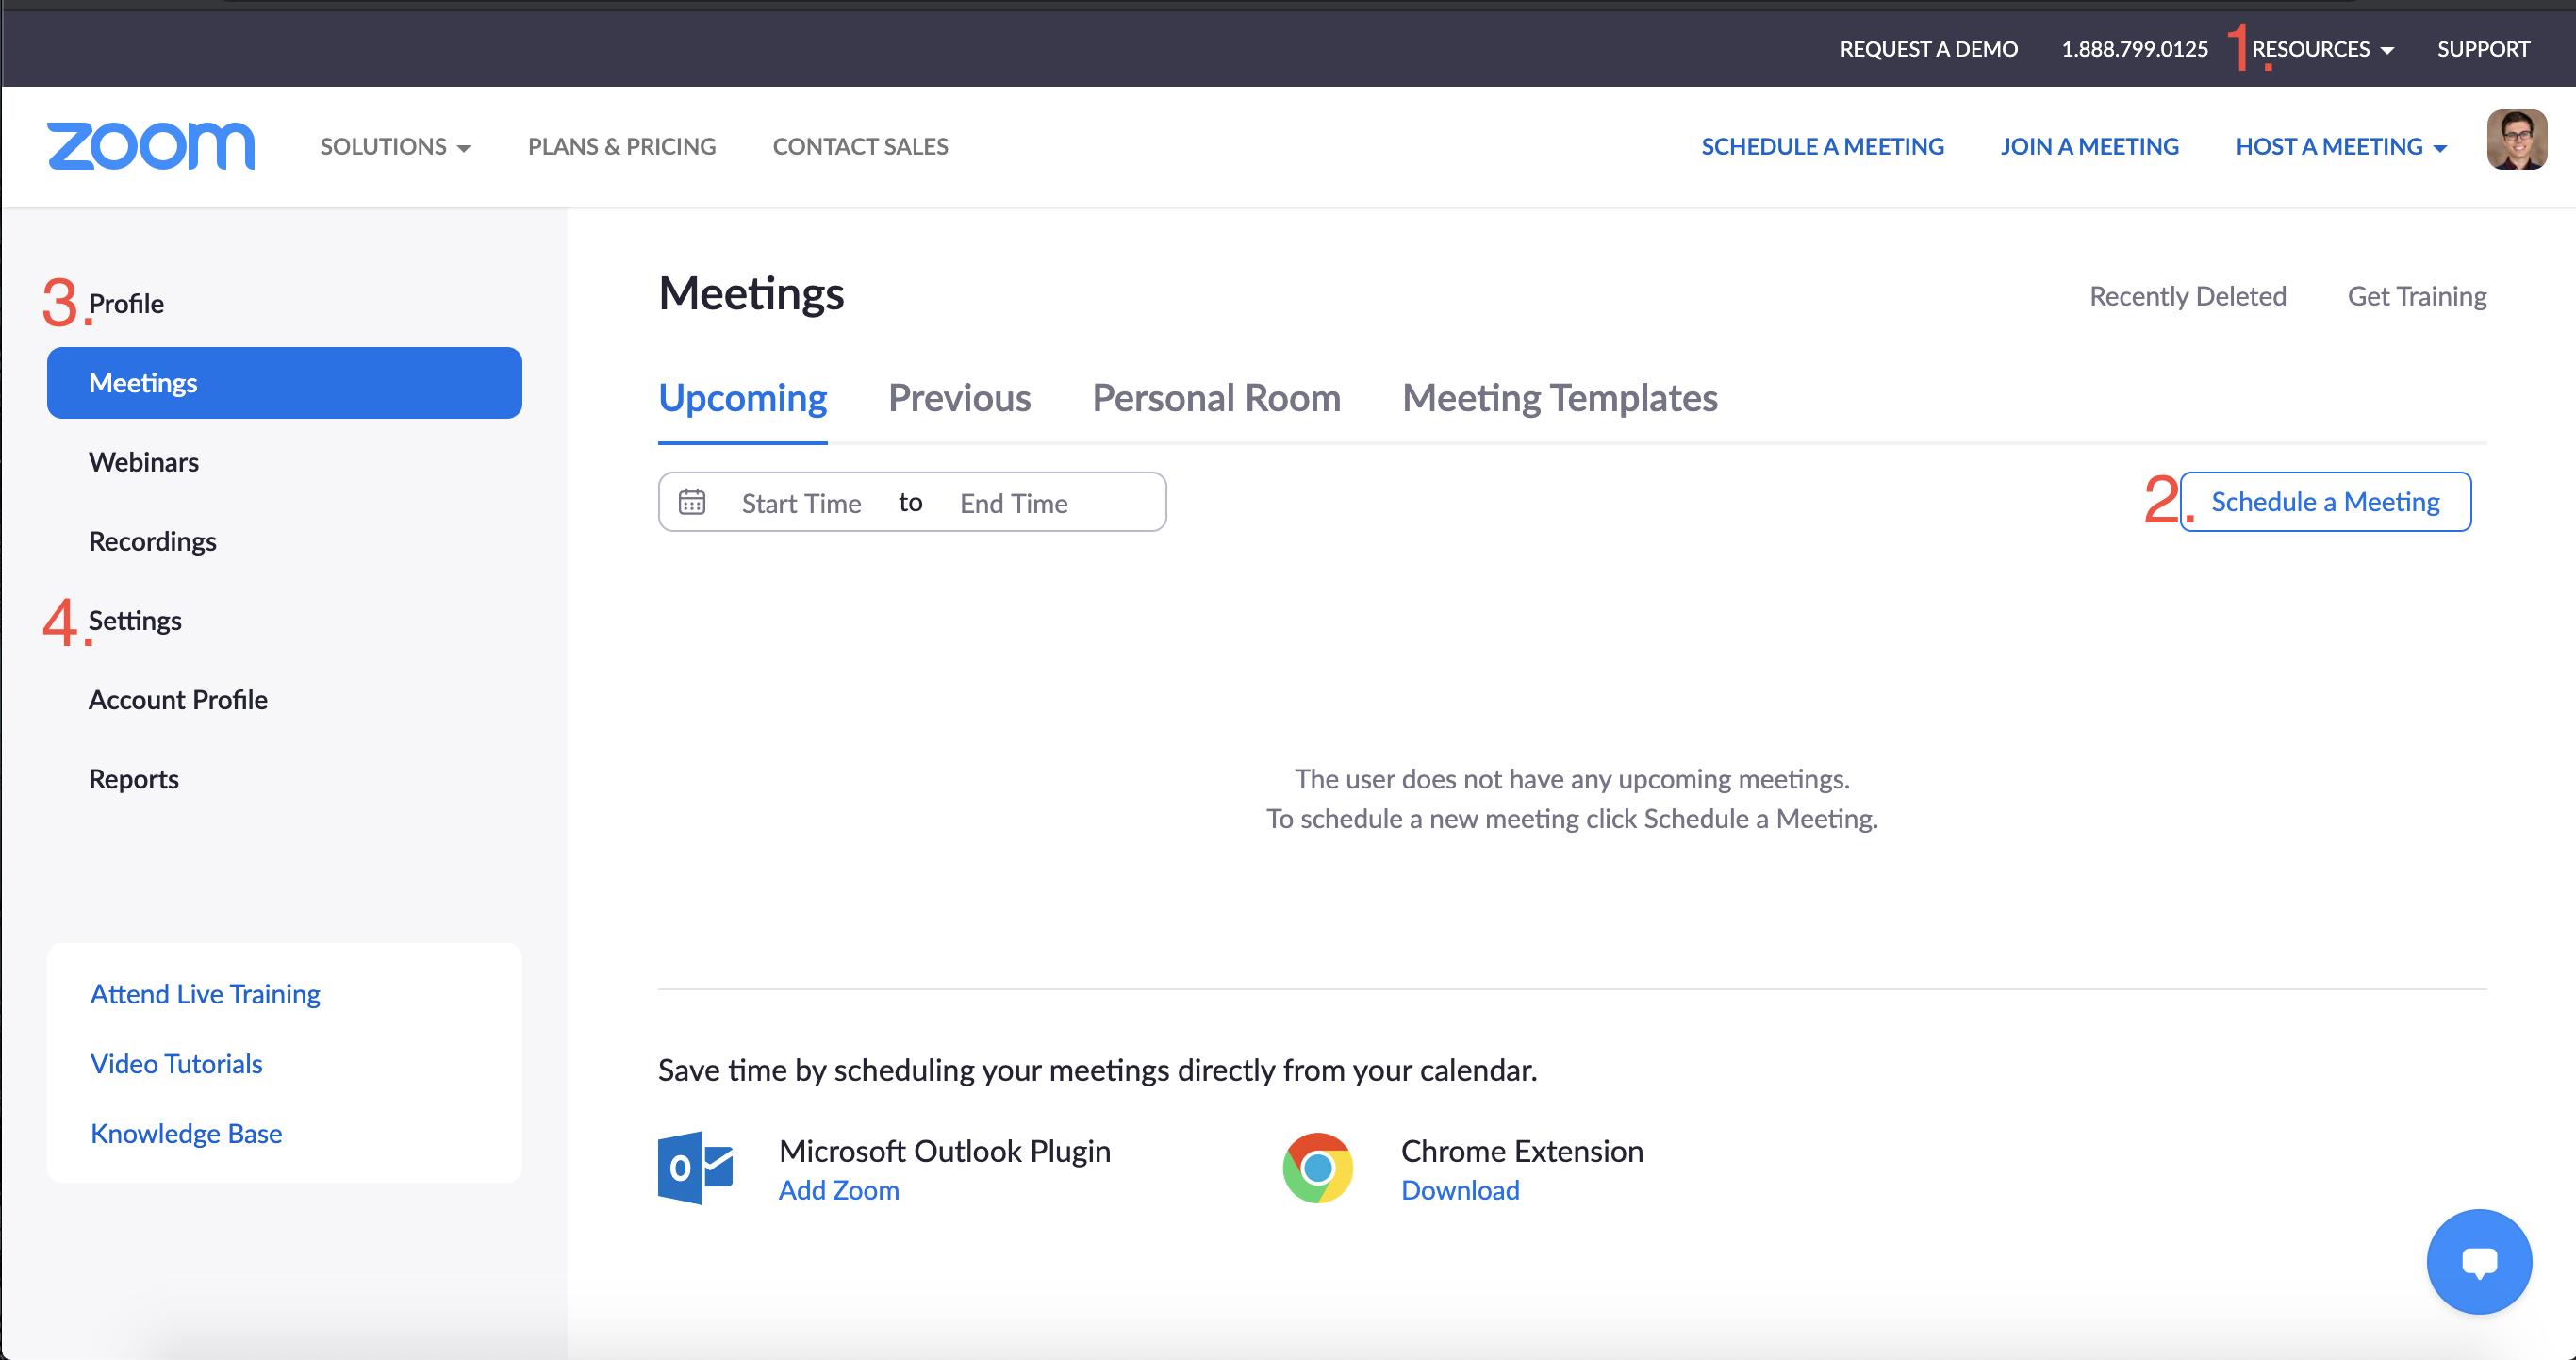 A screenshot of the Zoom web interface at the Meetings menu option